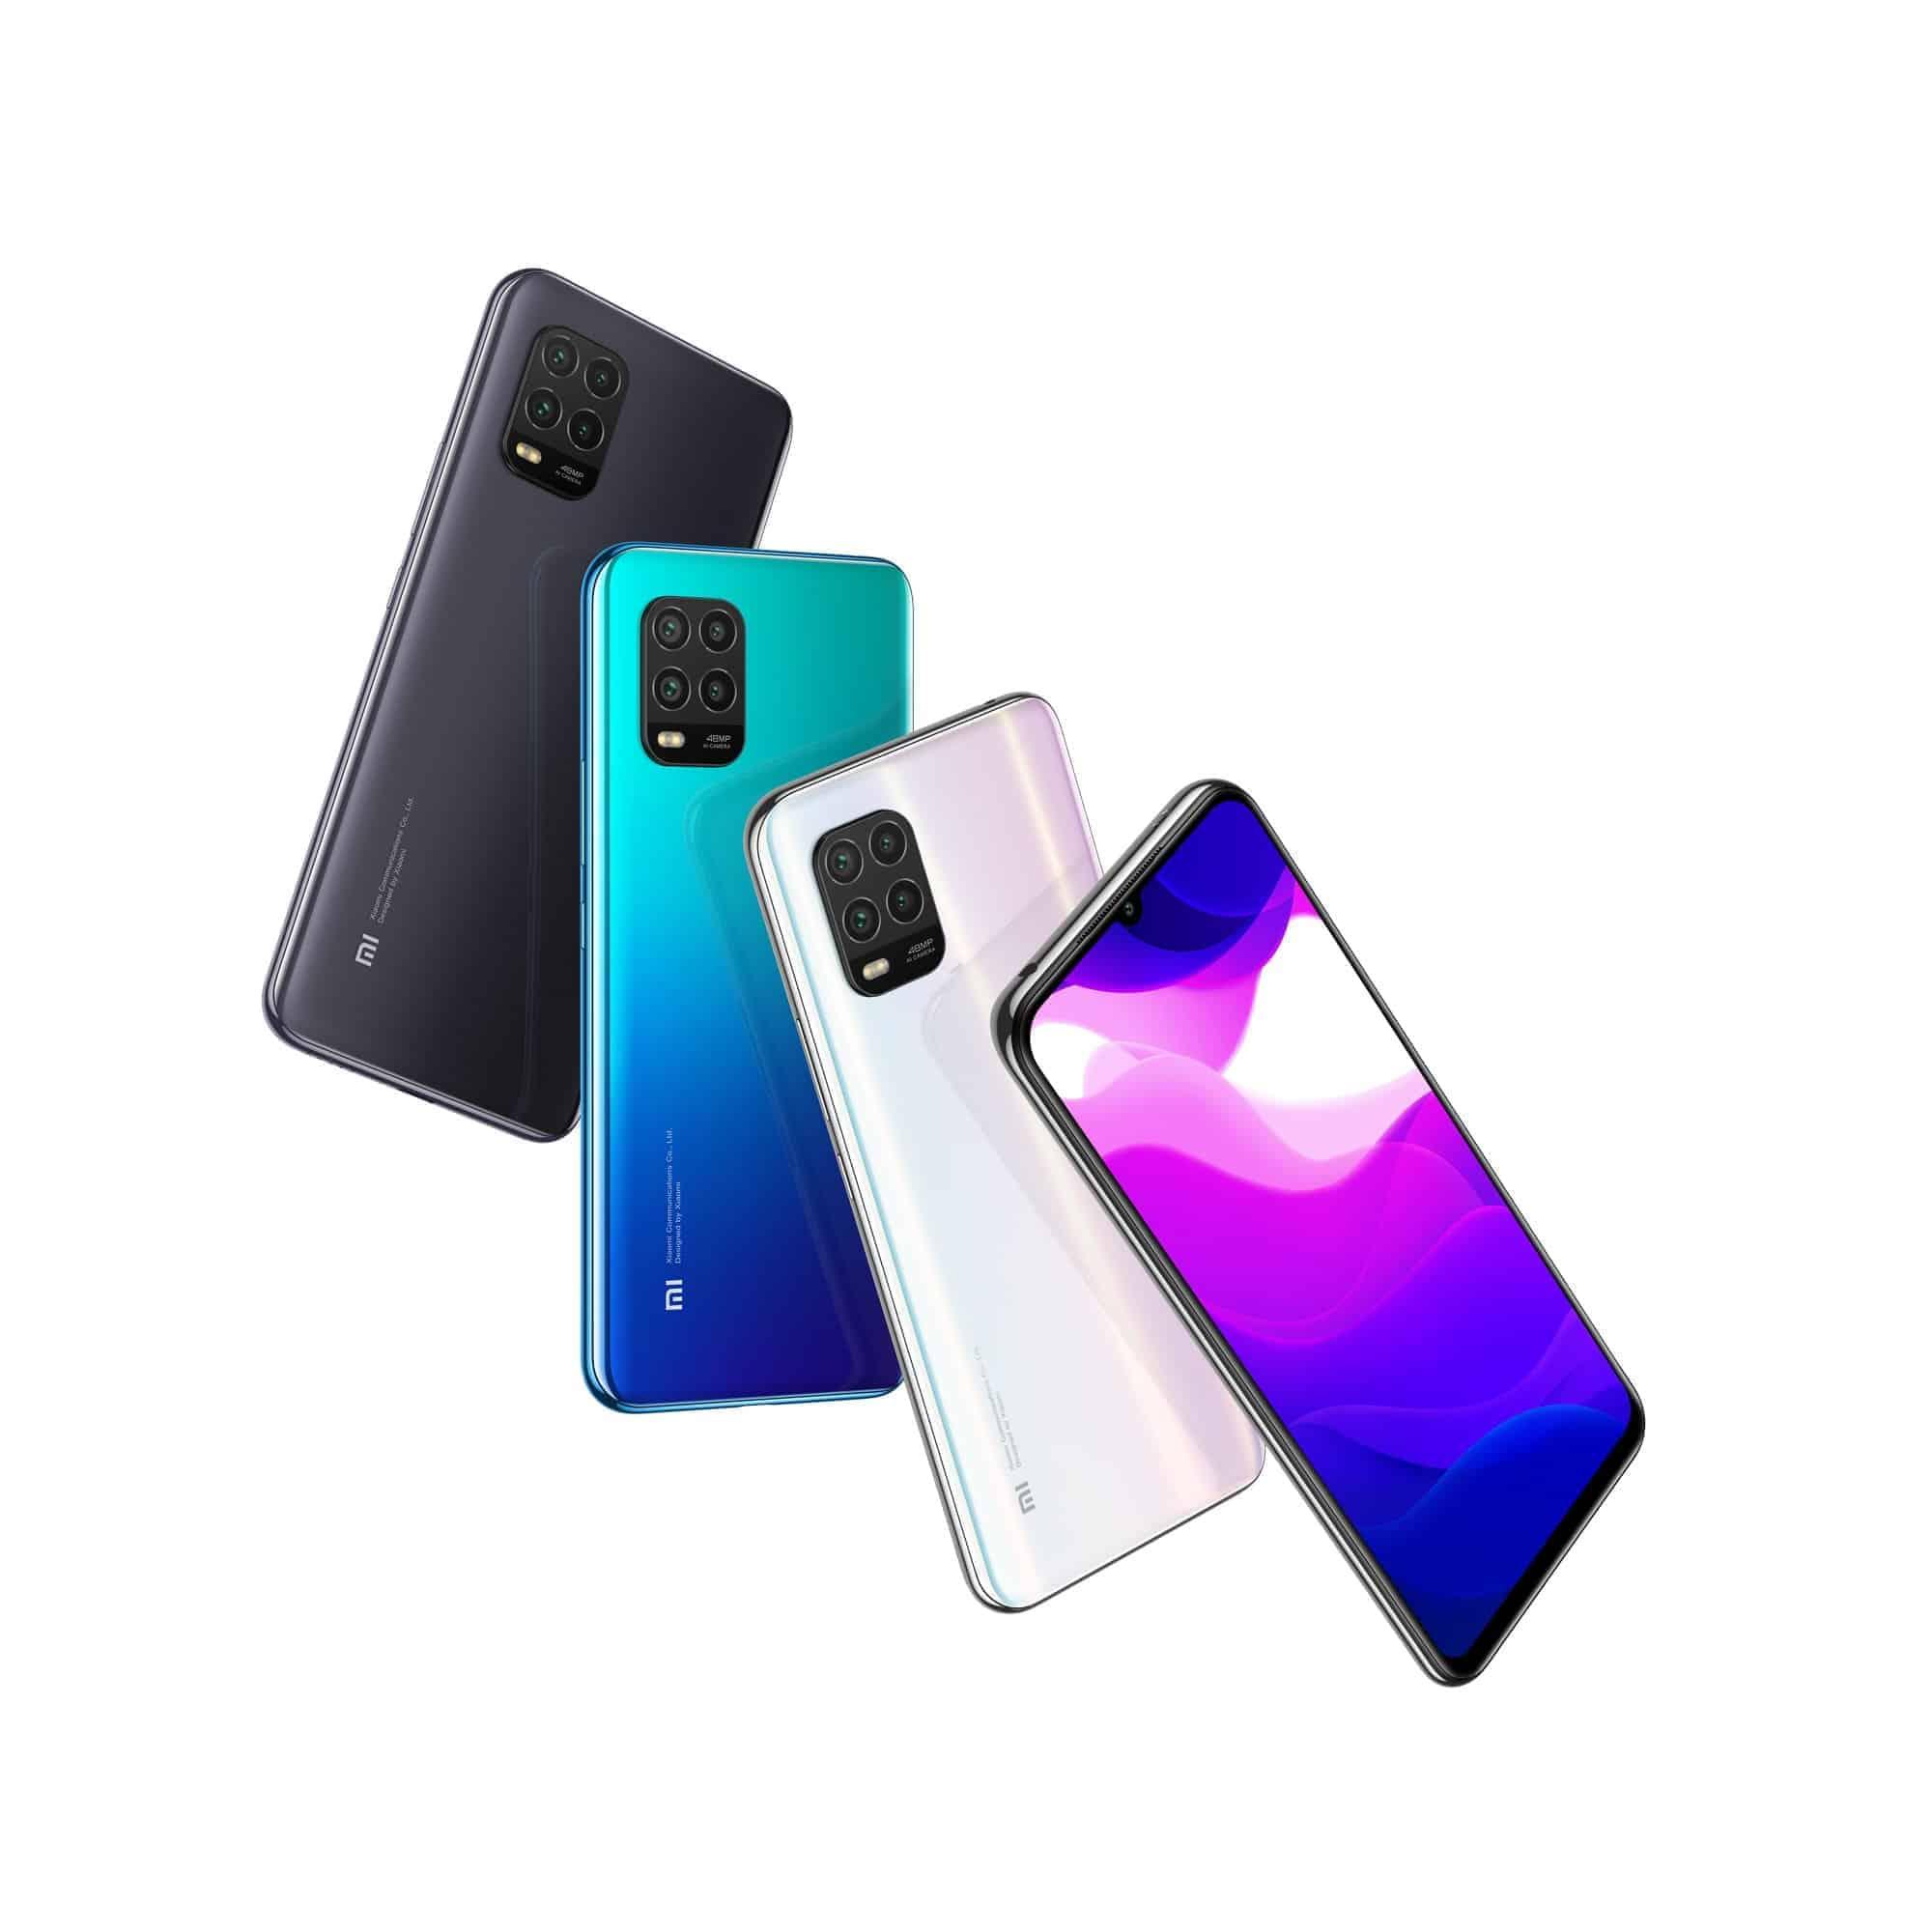 Xiaomi Mi 10 Lite image 2